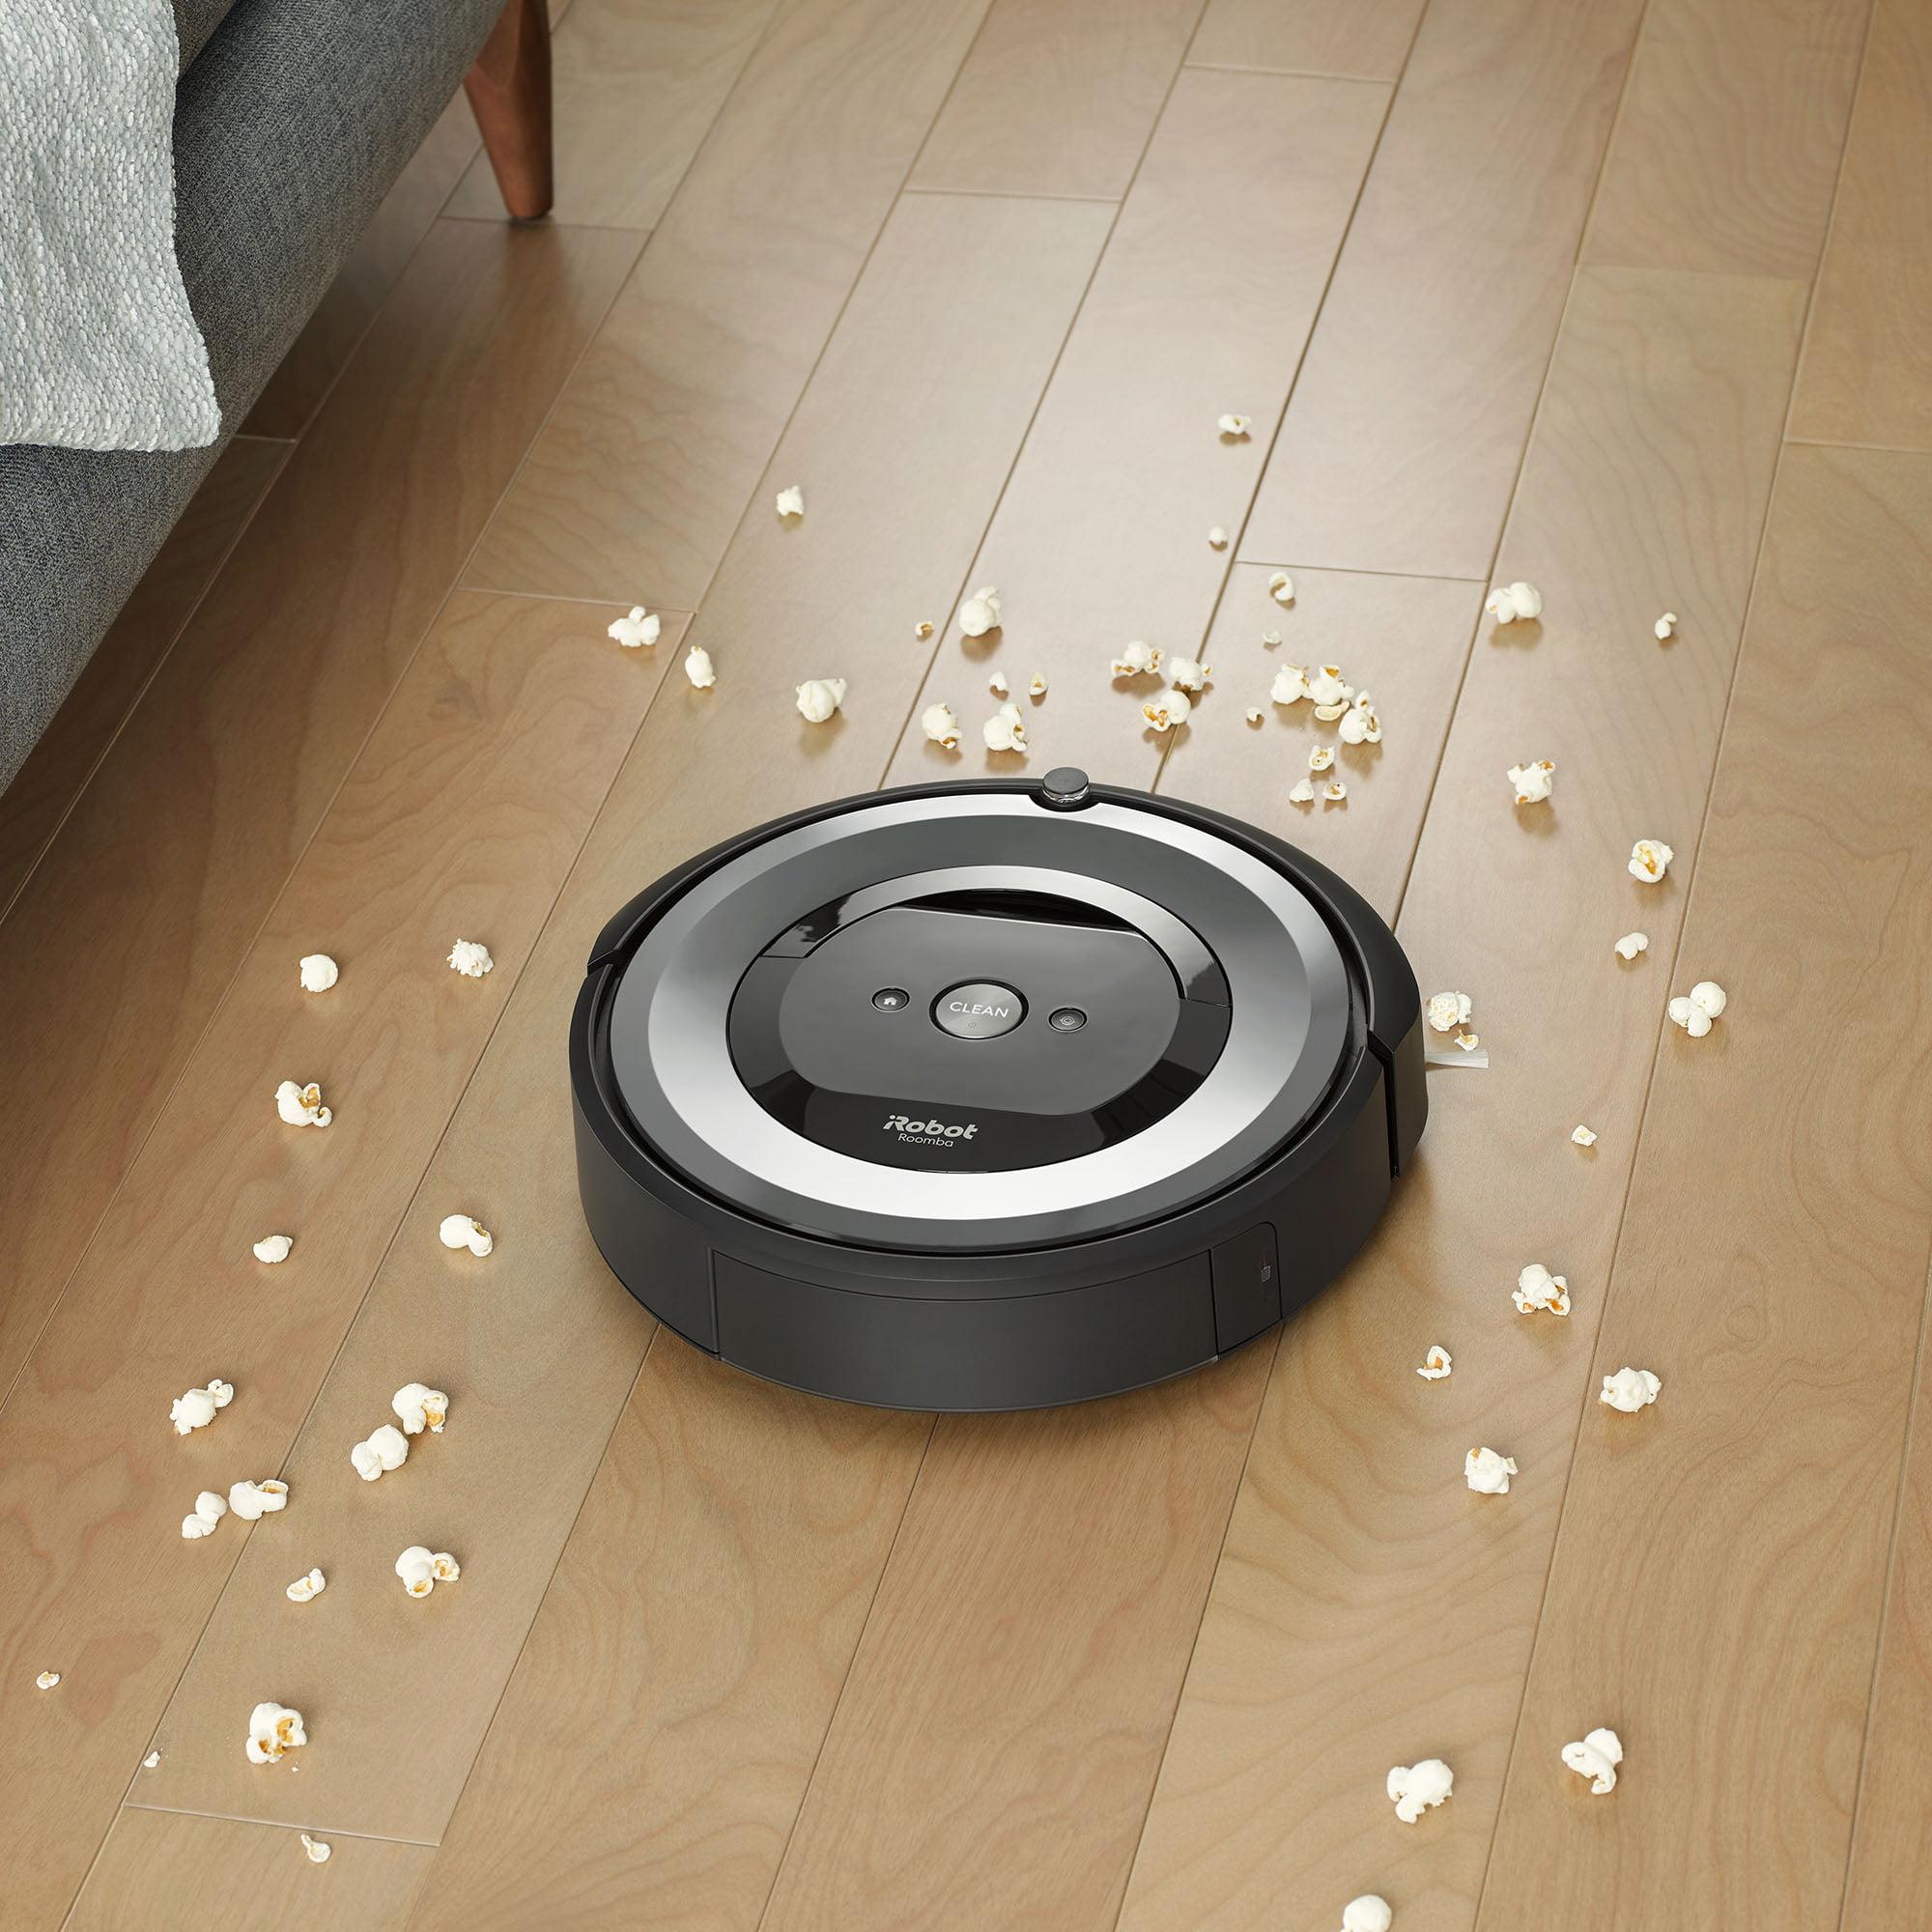 iRobot Roomba e6 Wi-Fi Connected Robot Vacuum - Walmart com